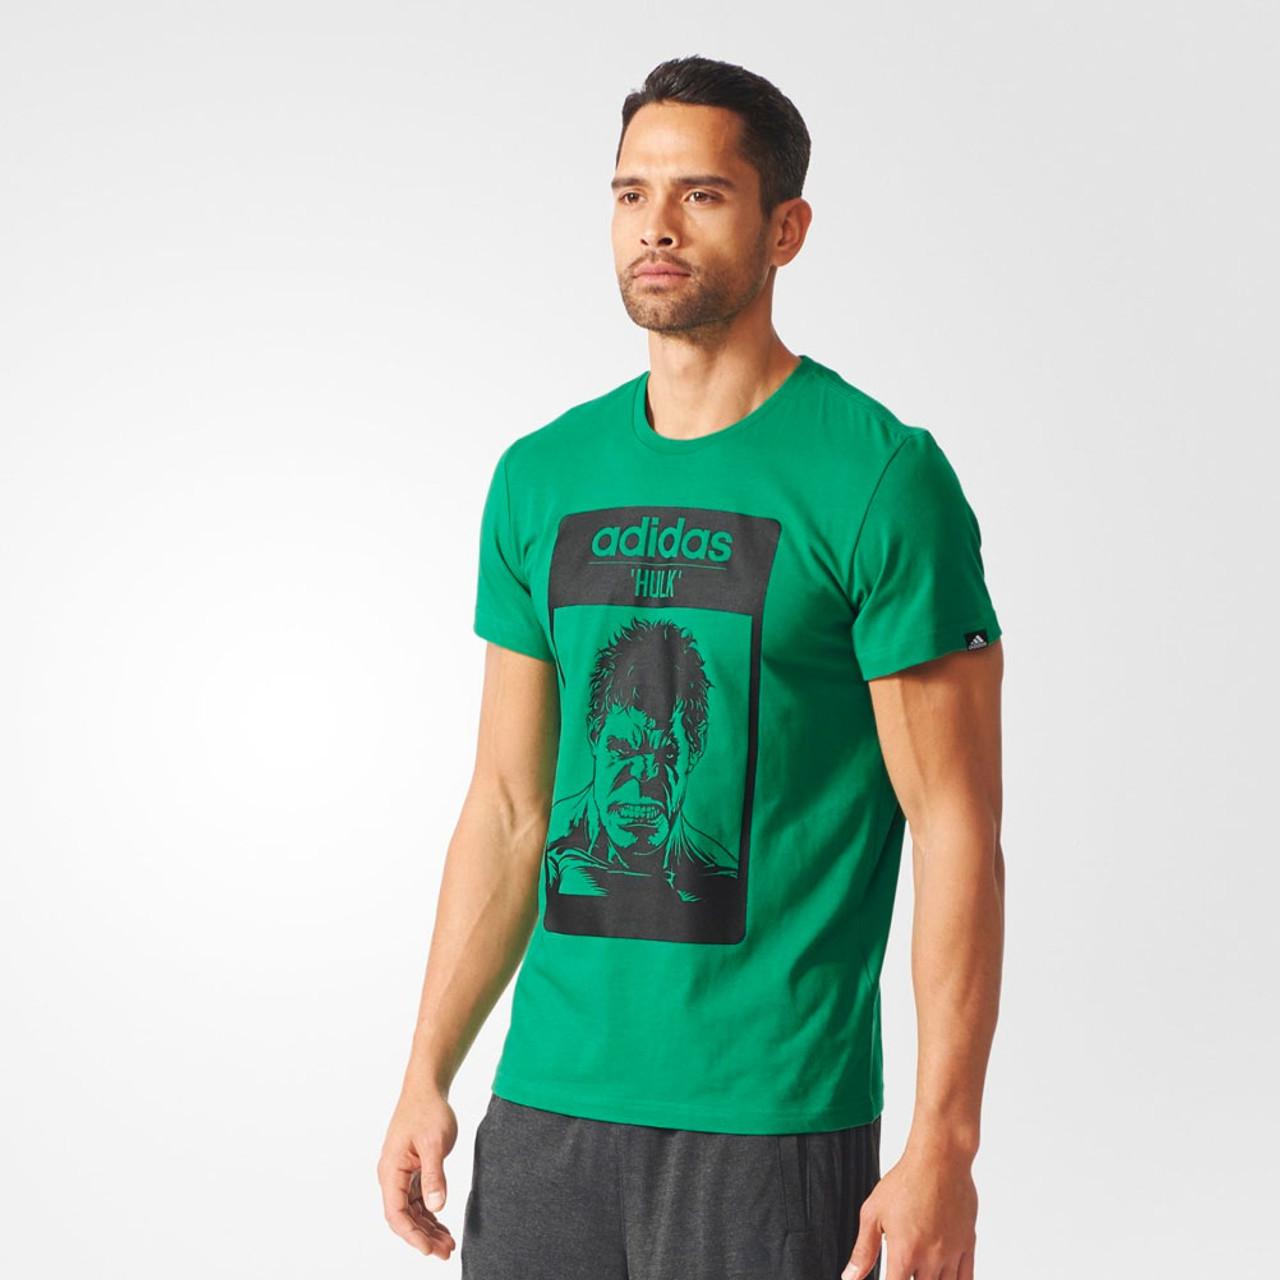 Adidas T Graphic T T Adidas Adidas Hulk Graphic Graphic Hulk Shirtgreen Shirtgreen Hulk H2WYeED9I